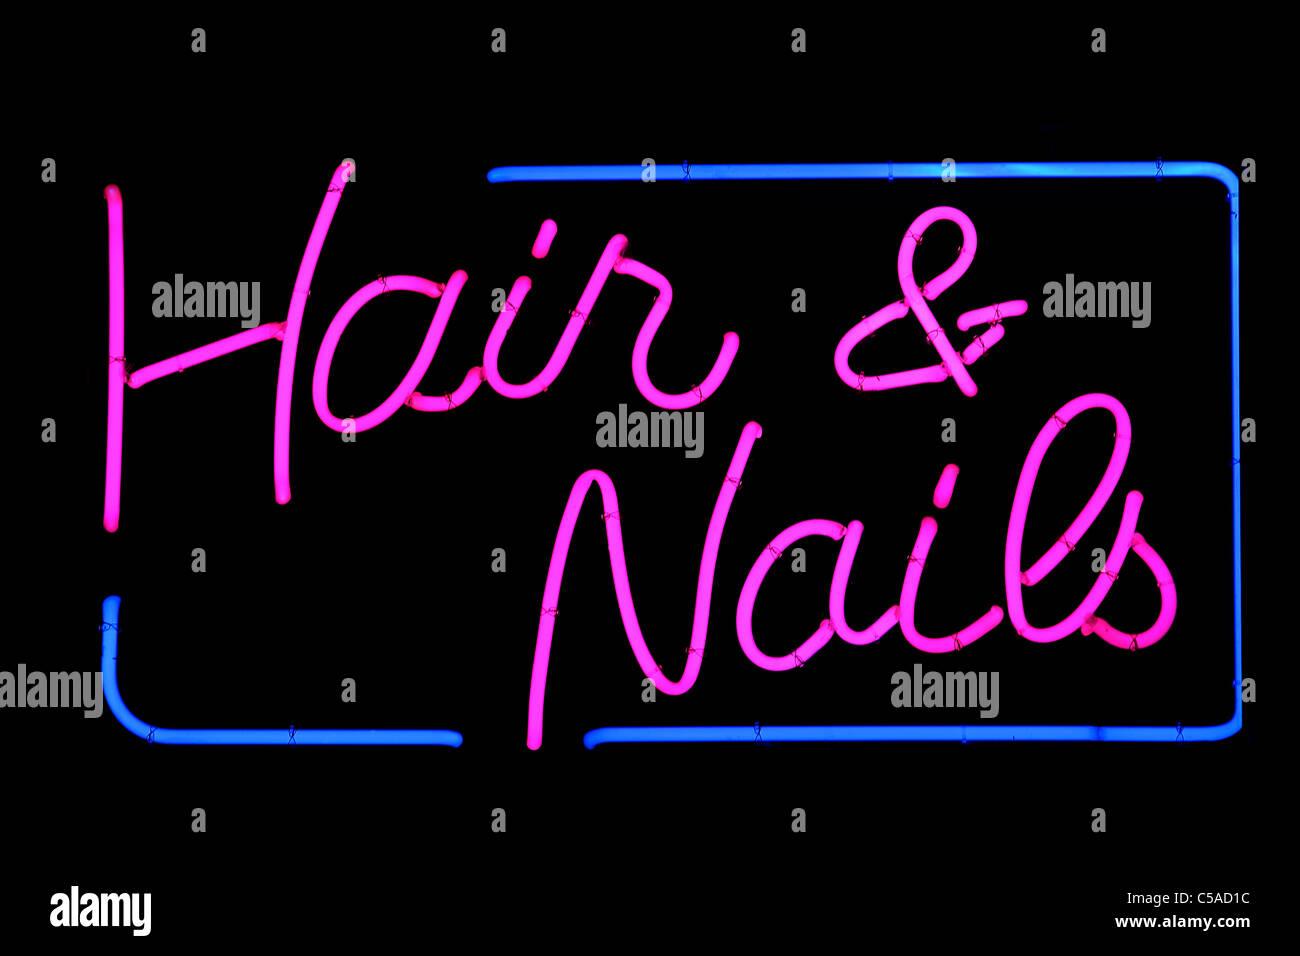 Hair Salon Sign Stock Photos & Hair Salon Sign Stock Images - Alamy